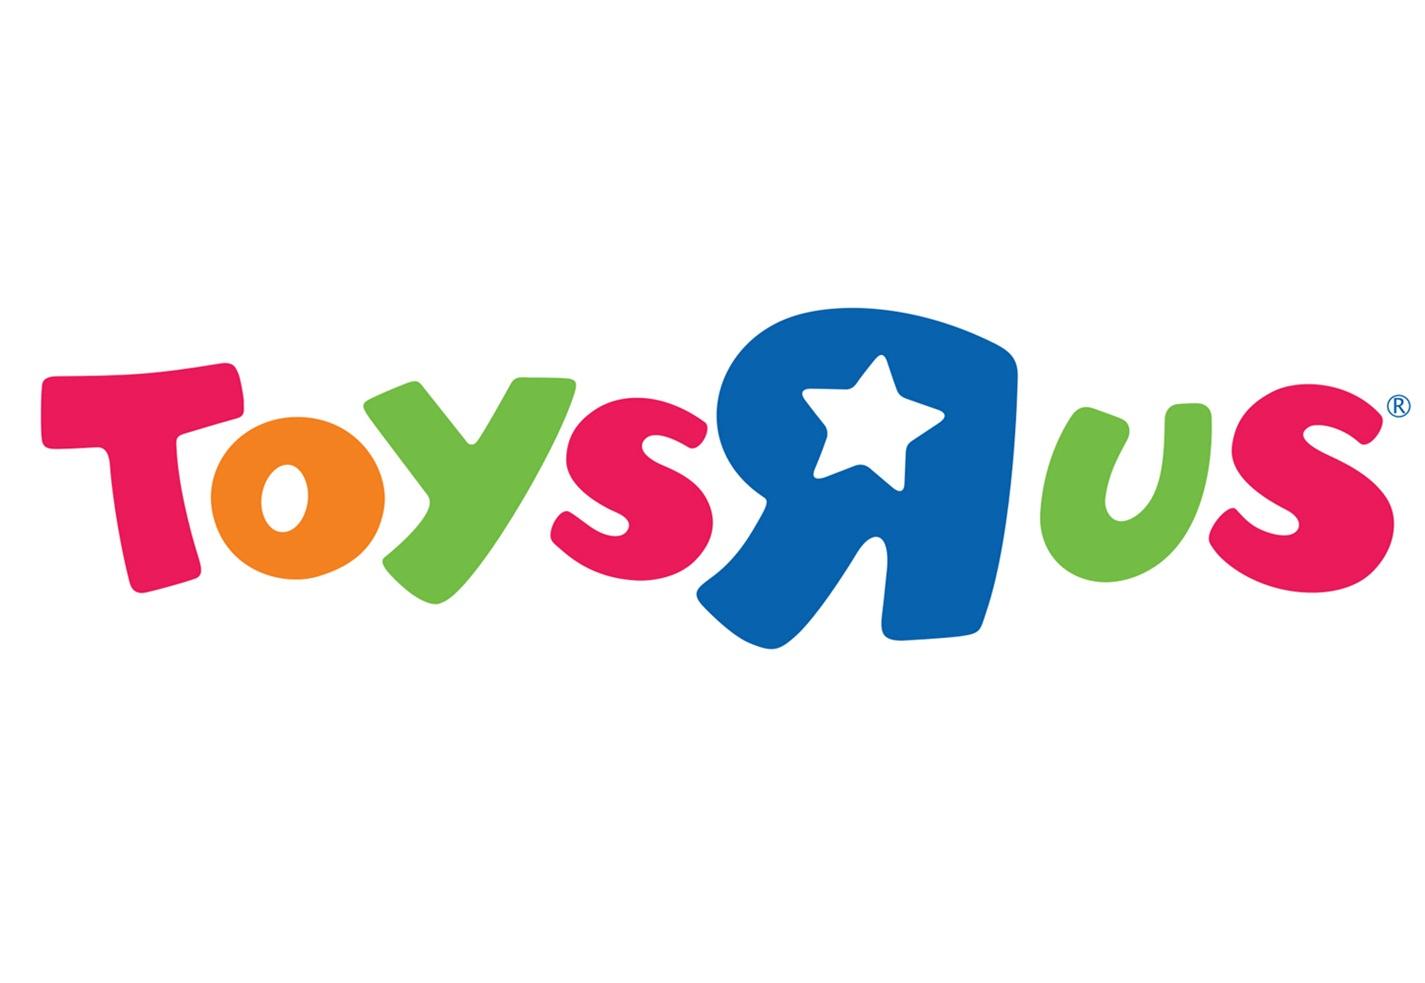 Toys r us todo un mundo lleno de juguetes - Sillones infantiles toysrus ...